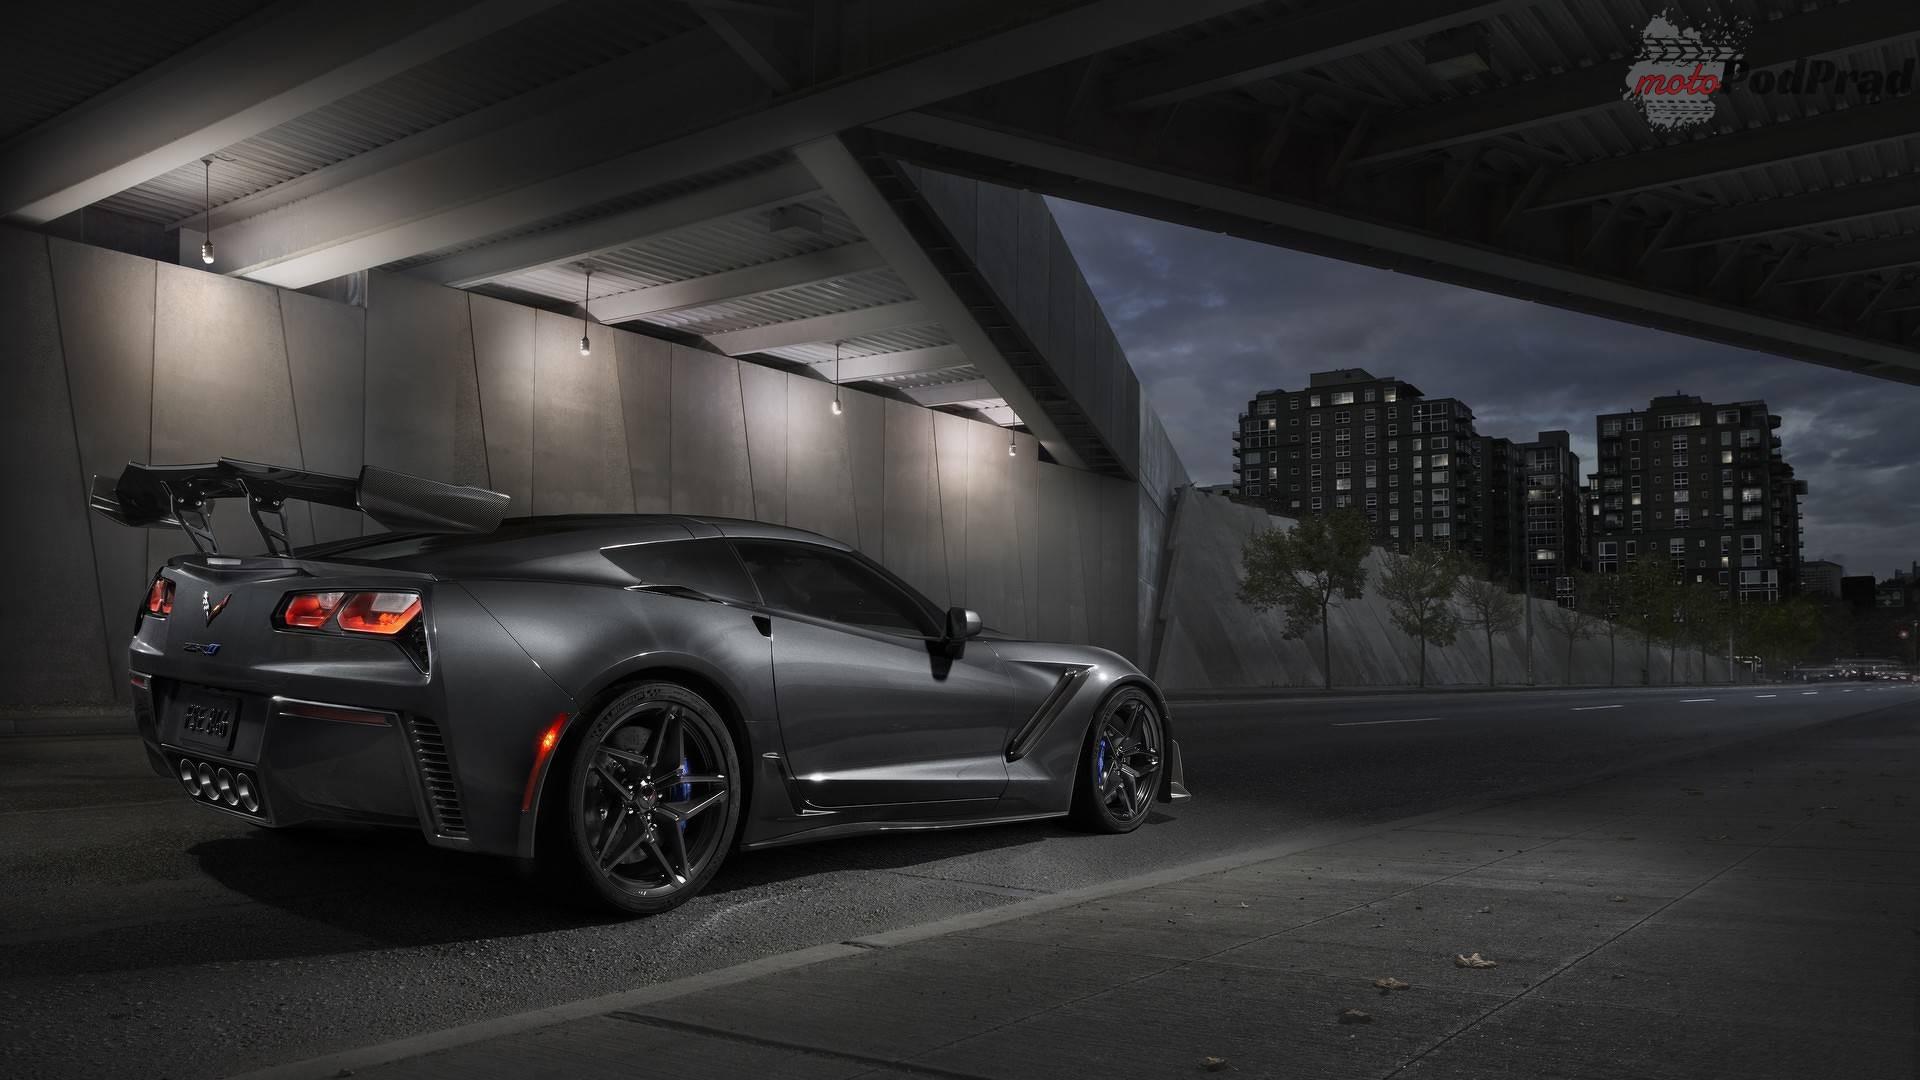 2019 chevy corvette zr1 1 Corvette + kompresor = ZR1